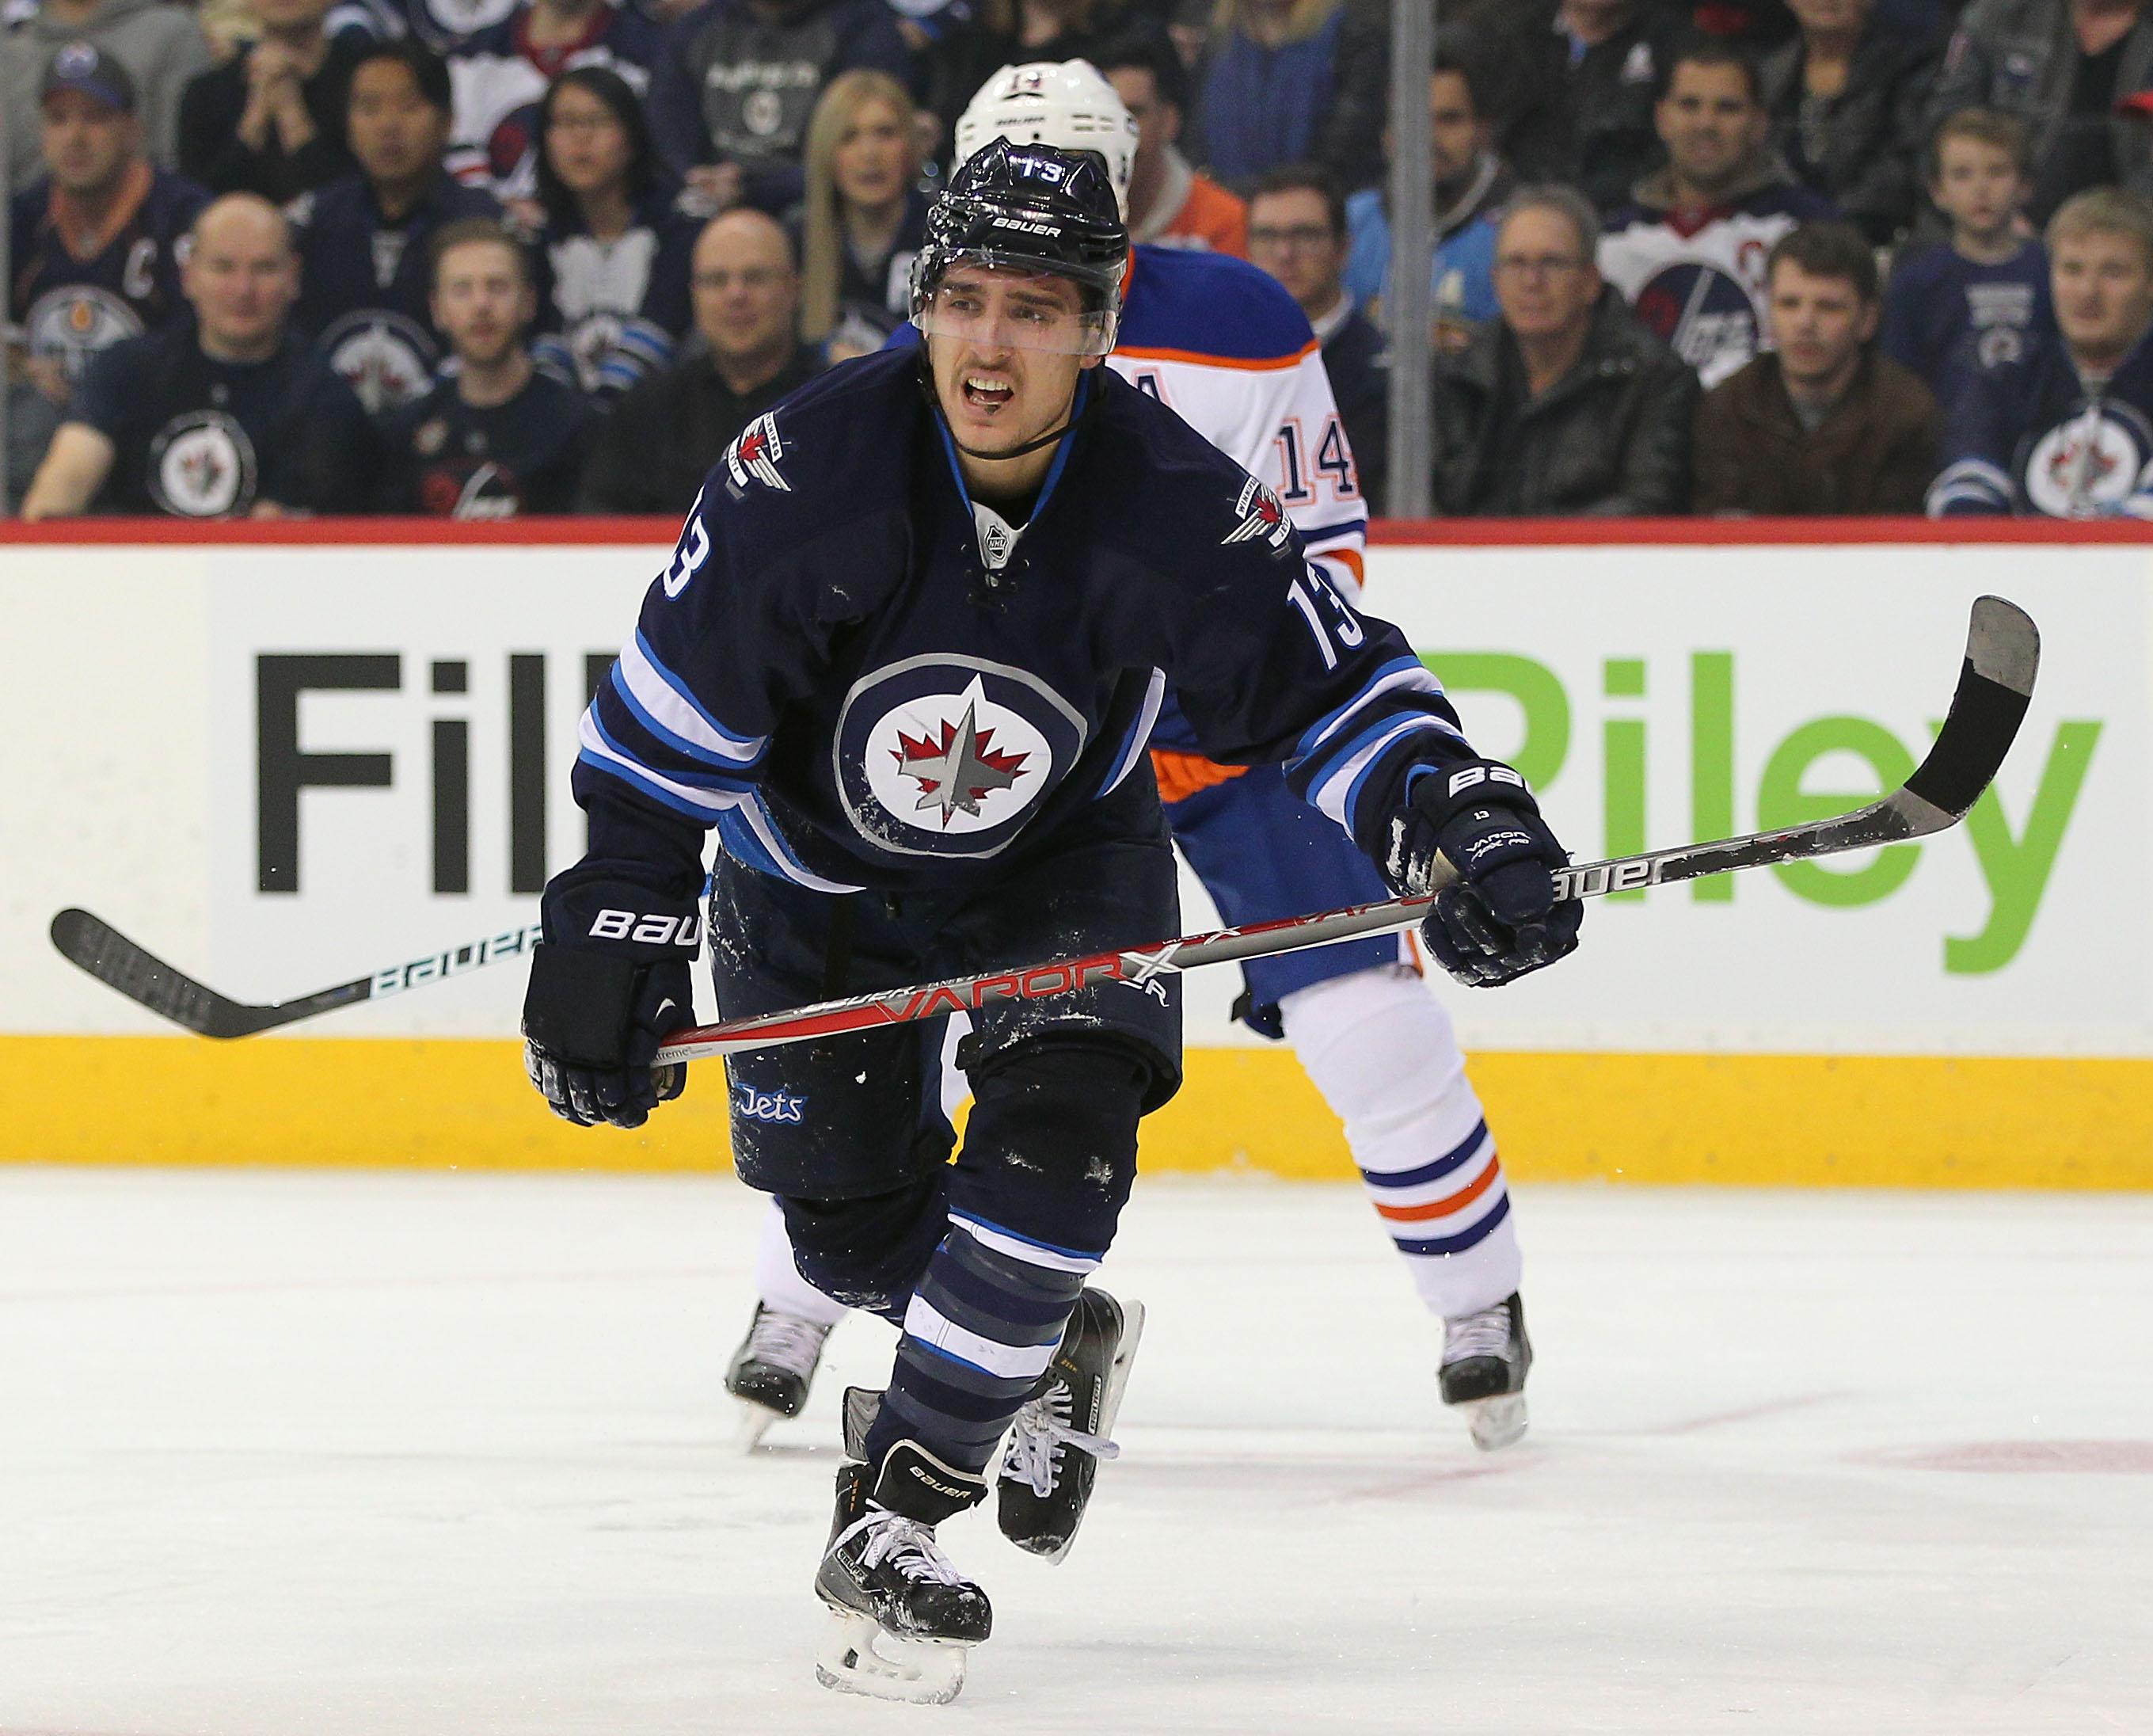 Winnipeg Jets Injuries Create Chance for Brandon Tanev